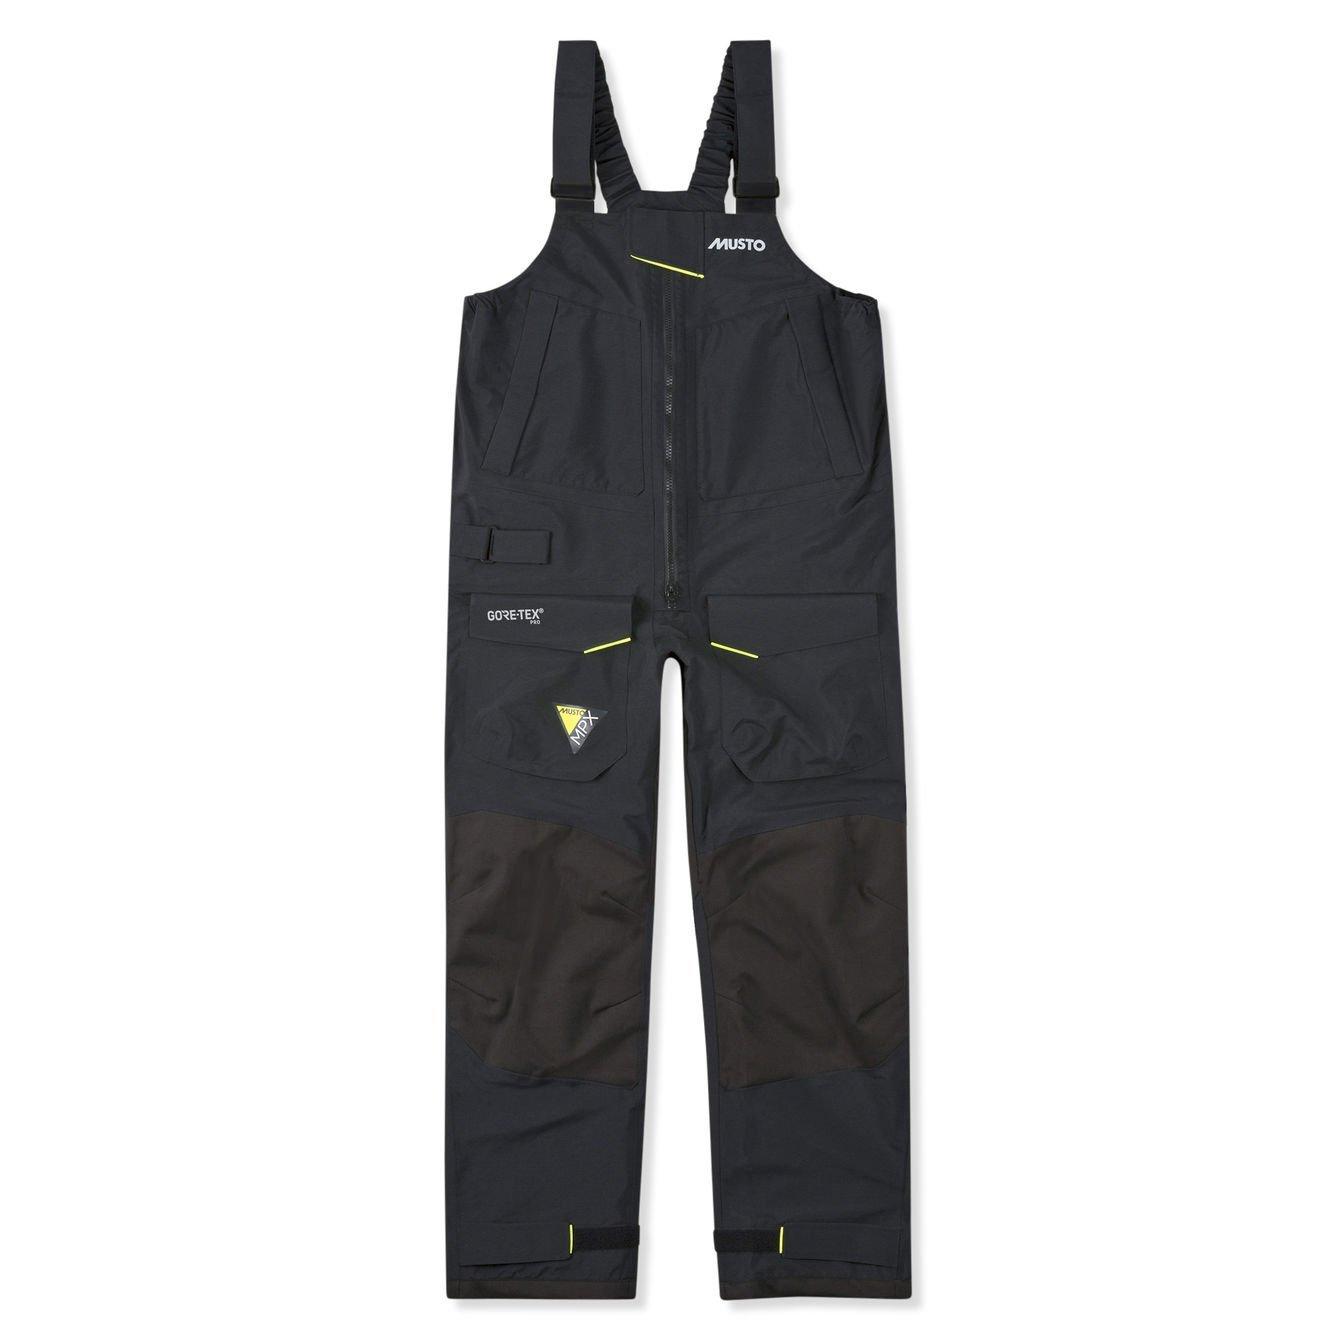 Musto MPX Gore-Tex Pro Offshore Offshore Offshore Trousers 2019 - Dark grau B0797J19HS Bekleidung Jugend überschwemmen a53d2b